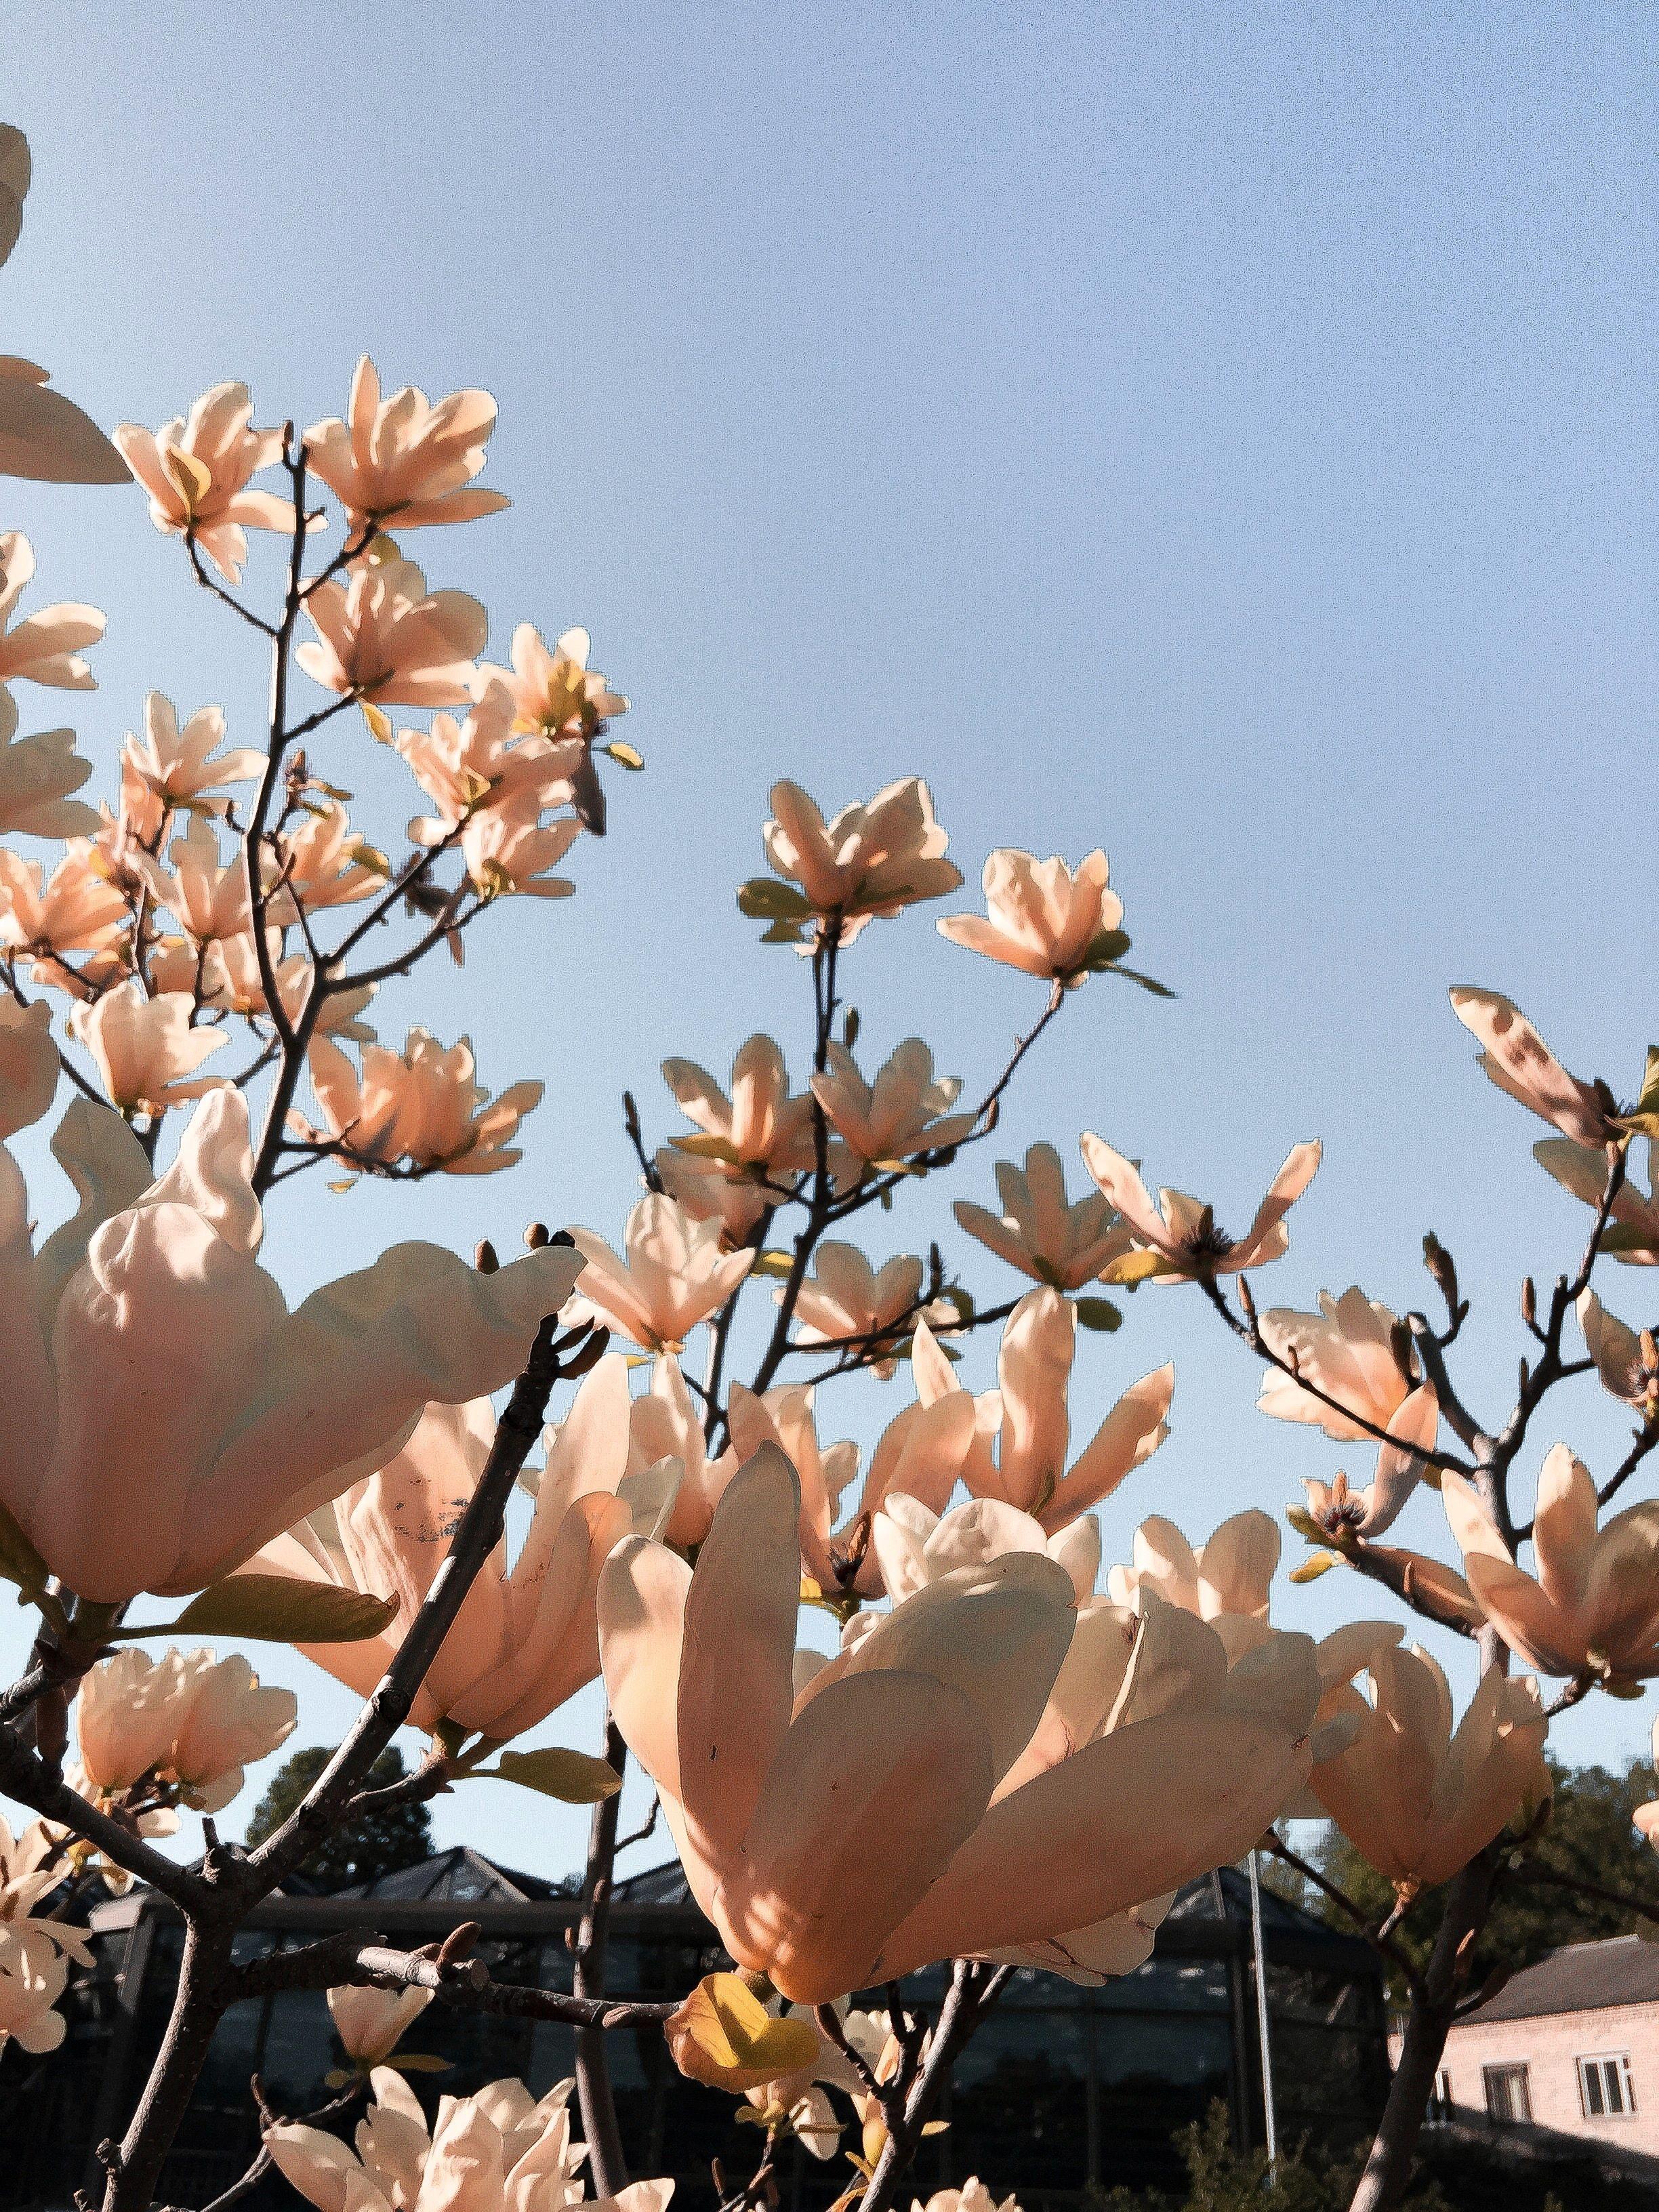 #Tree #Flower #Magnolia #Spring #Summer #Nature #Pink #Blue